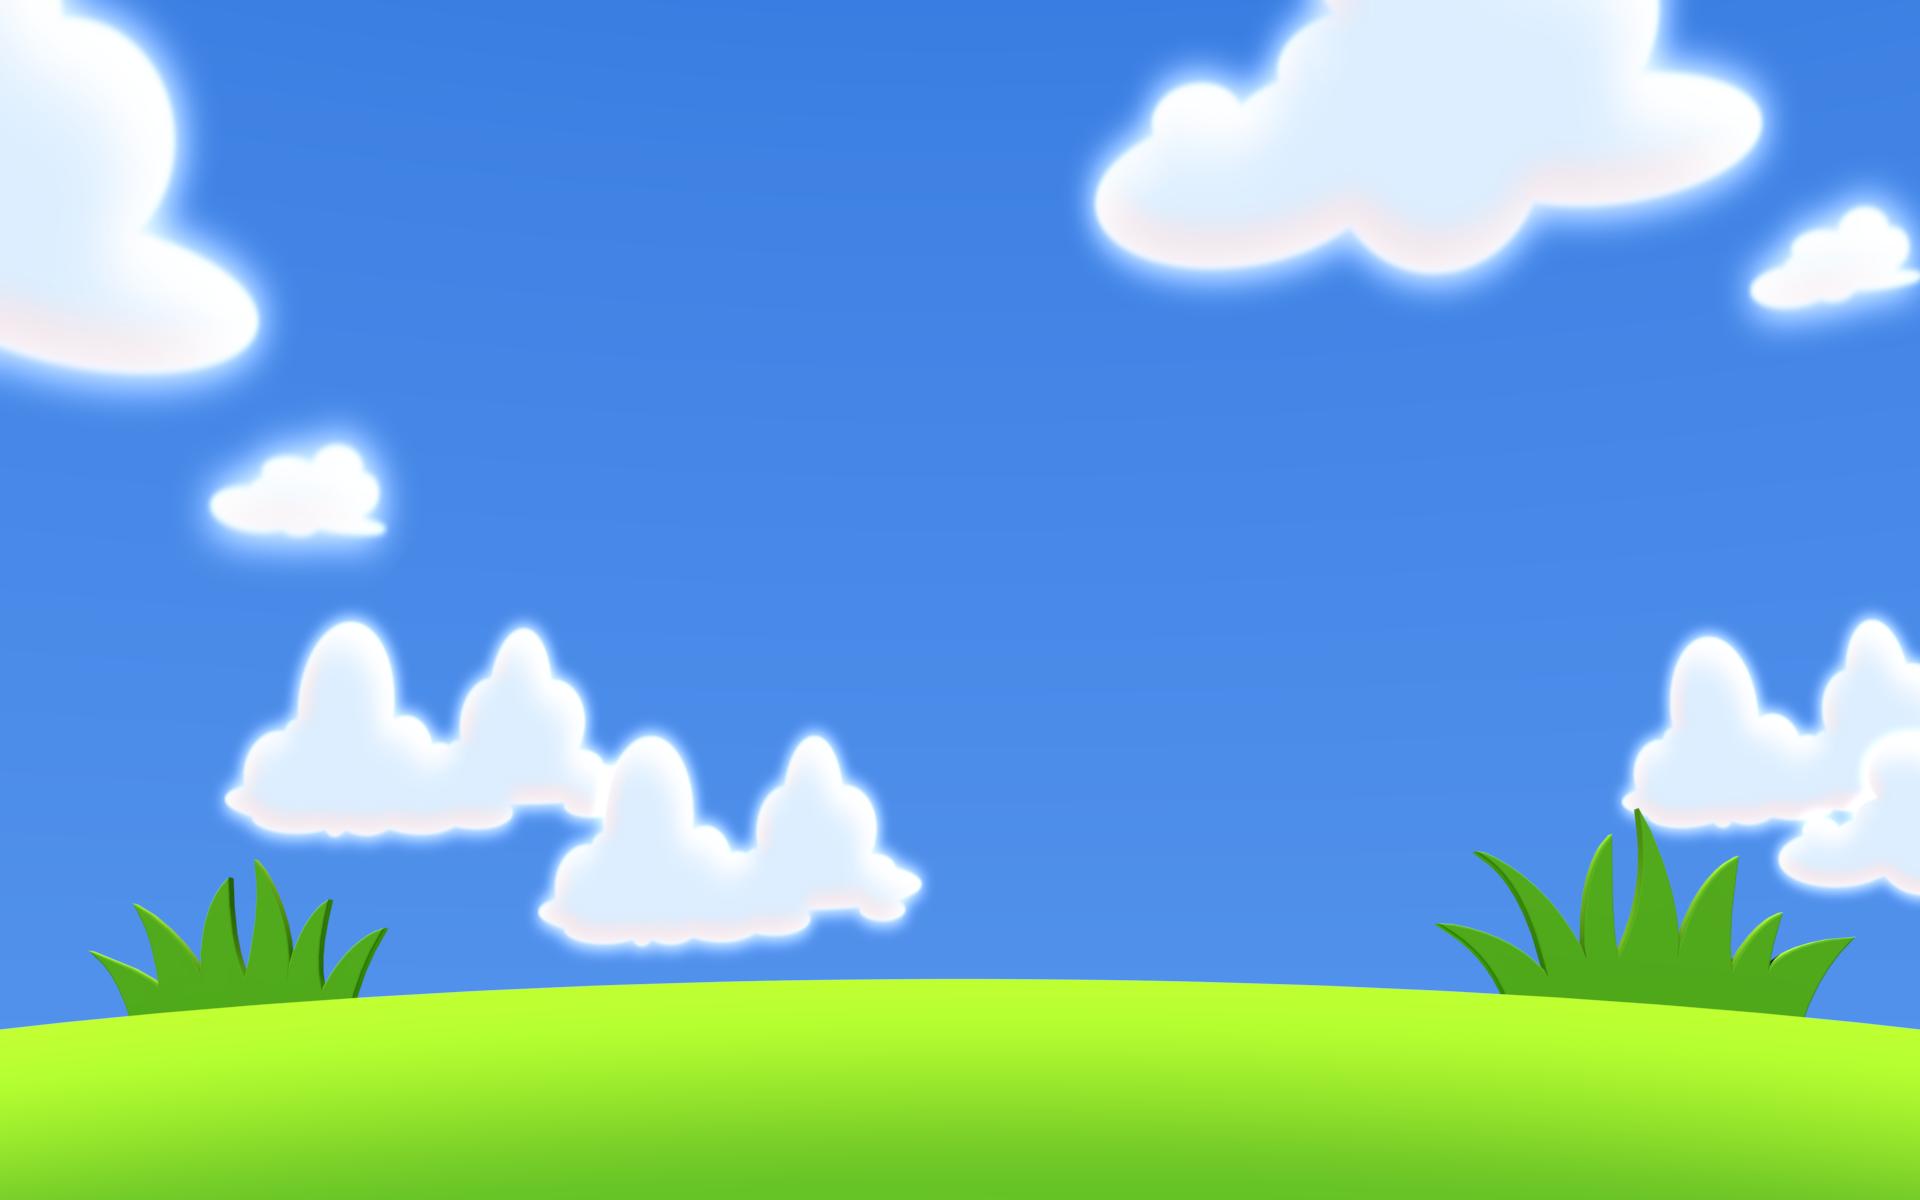 Background.